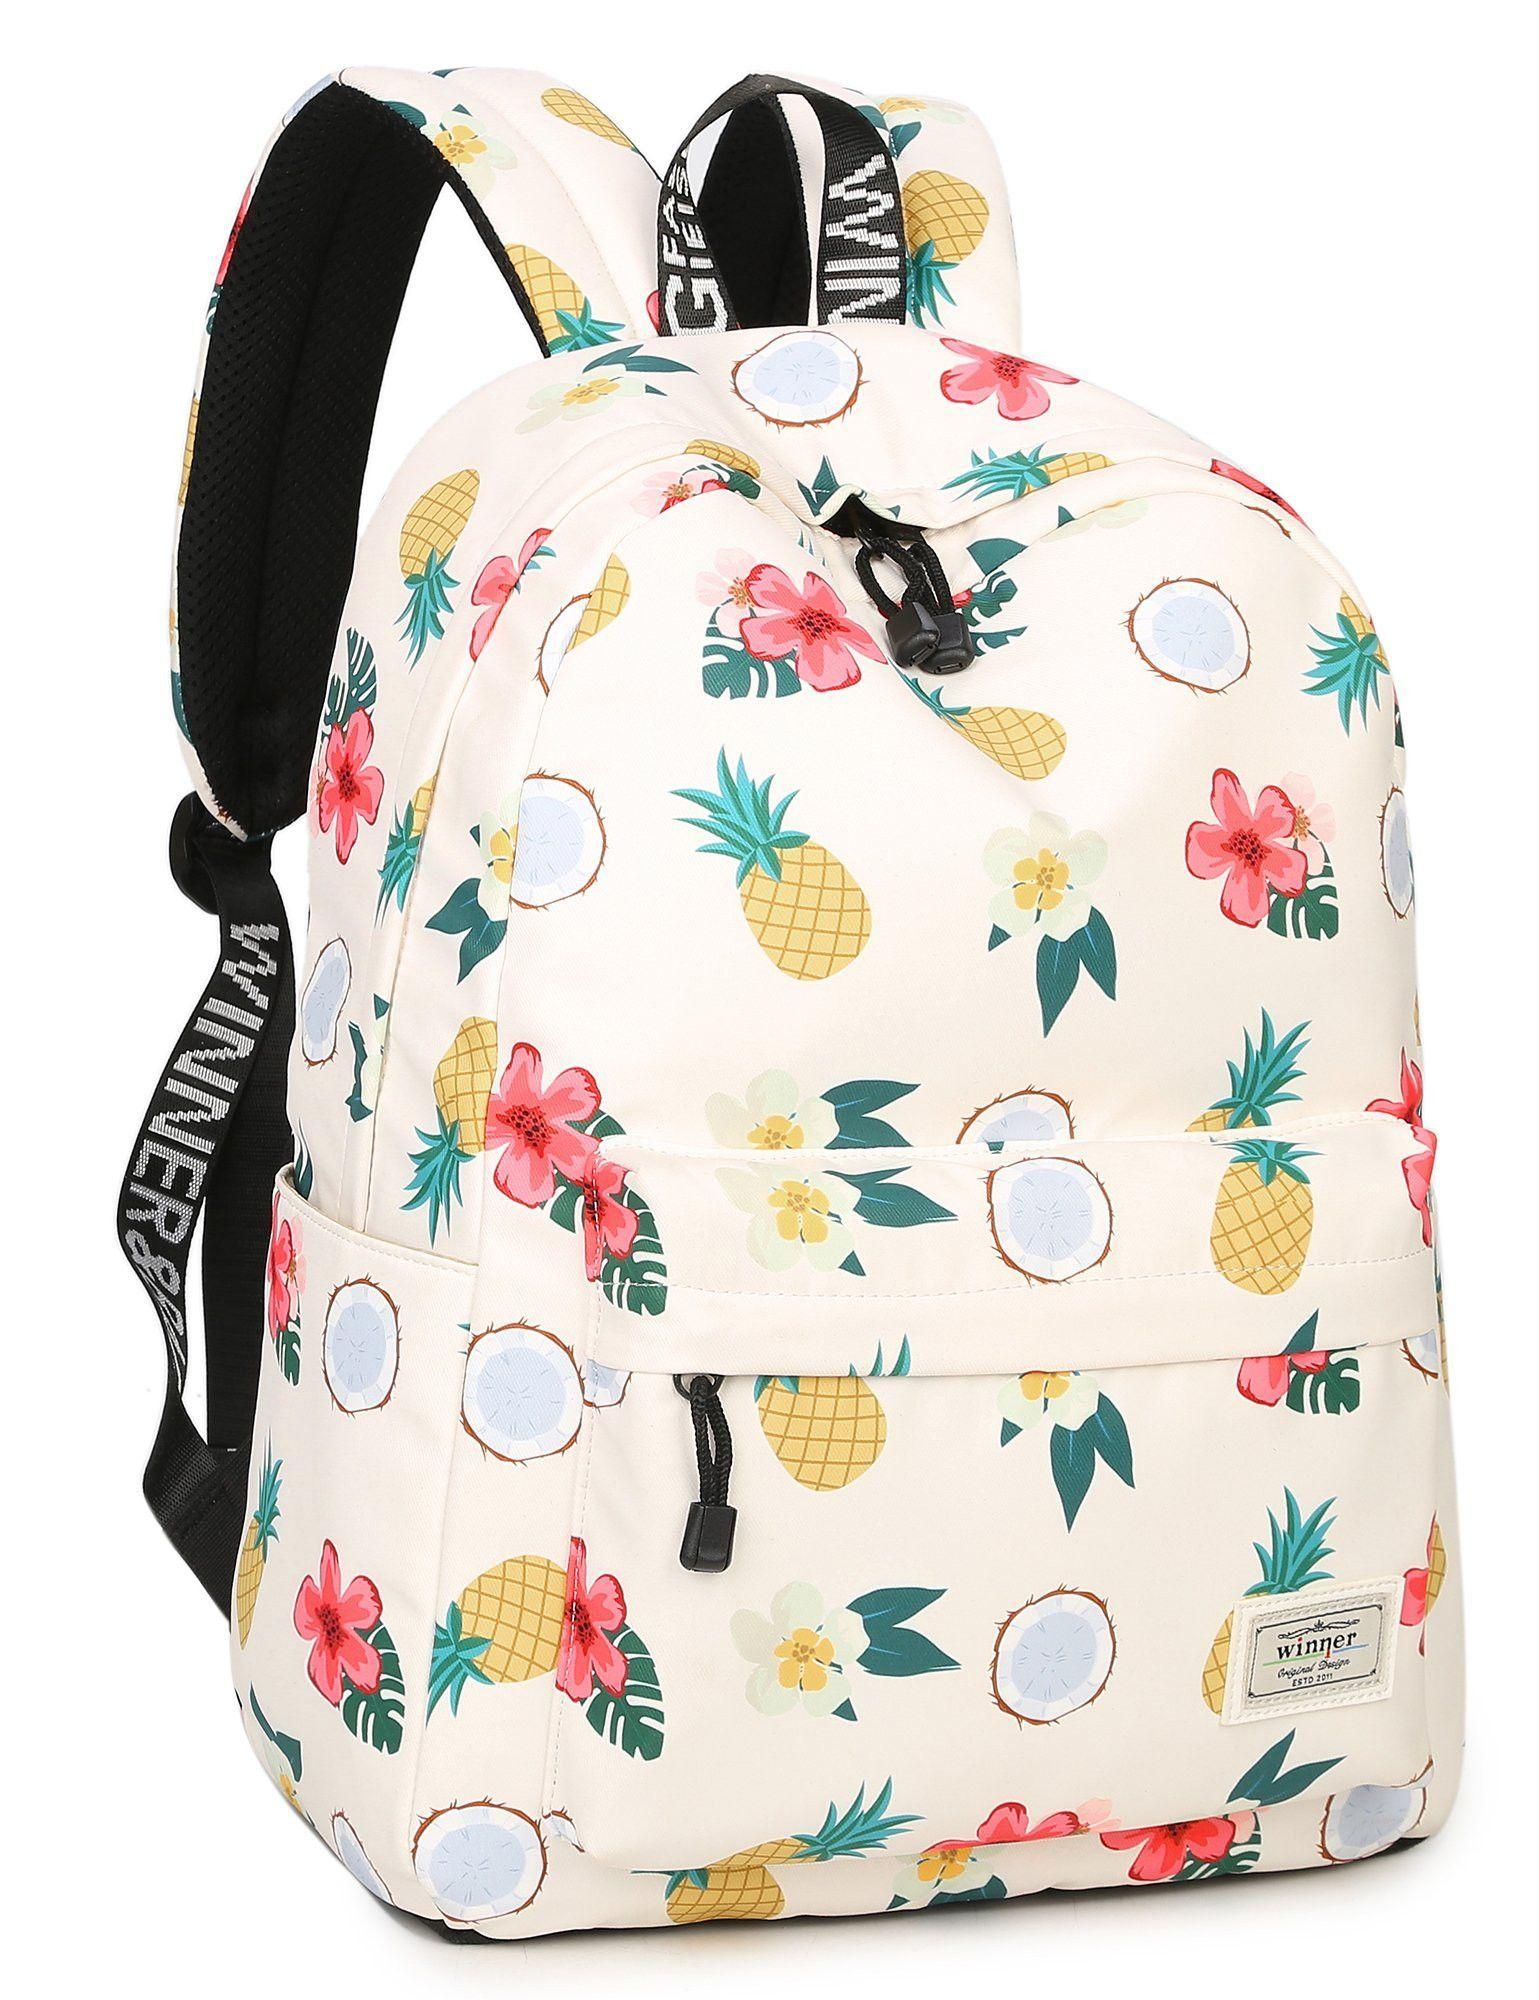 school bookbags for girls floral pineapple printed backpack